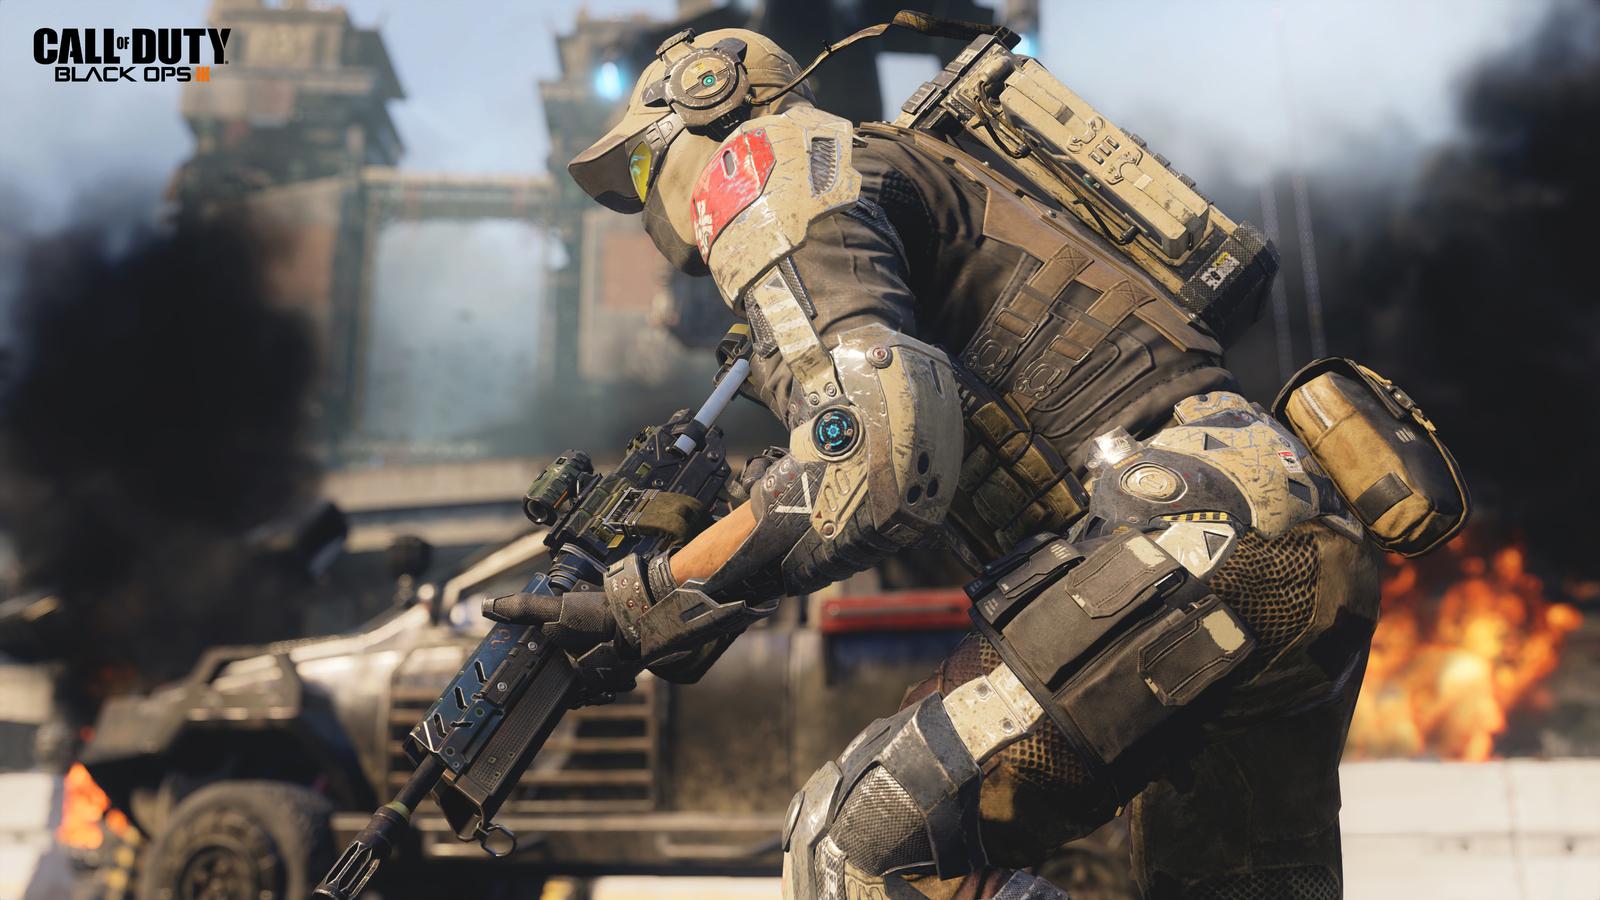 Black Ops 3 screenshot